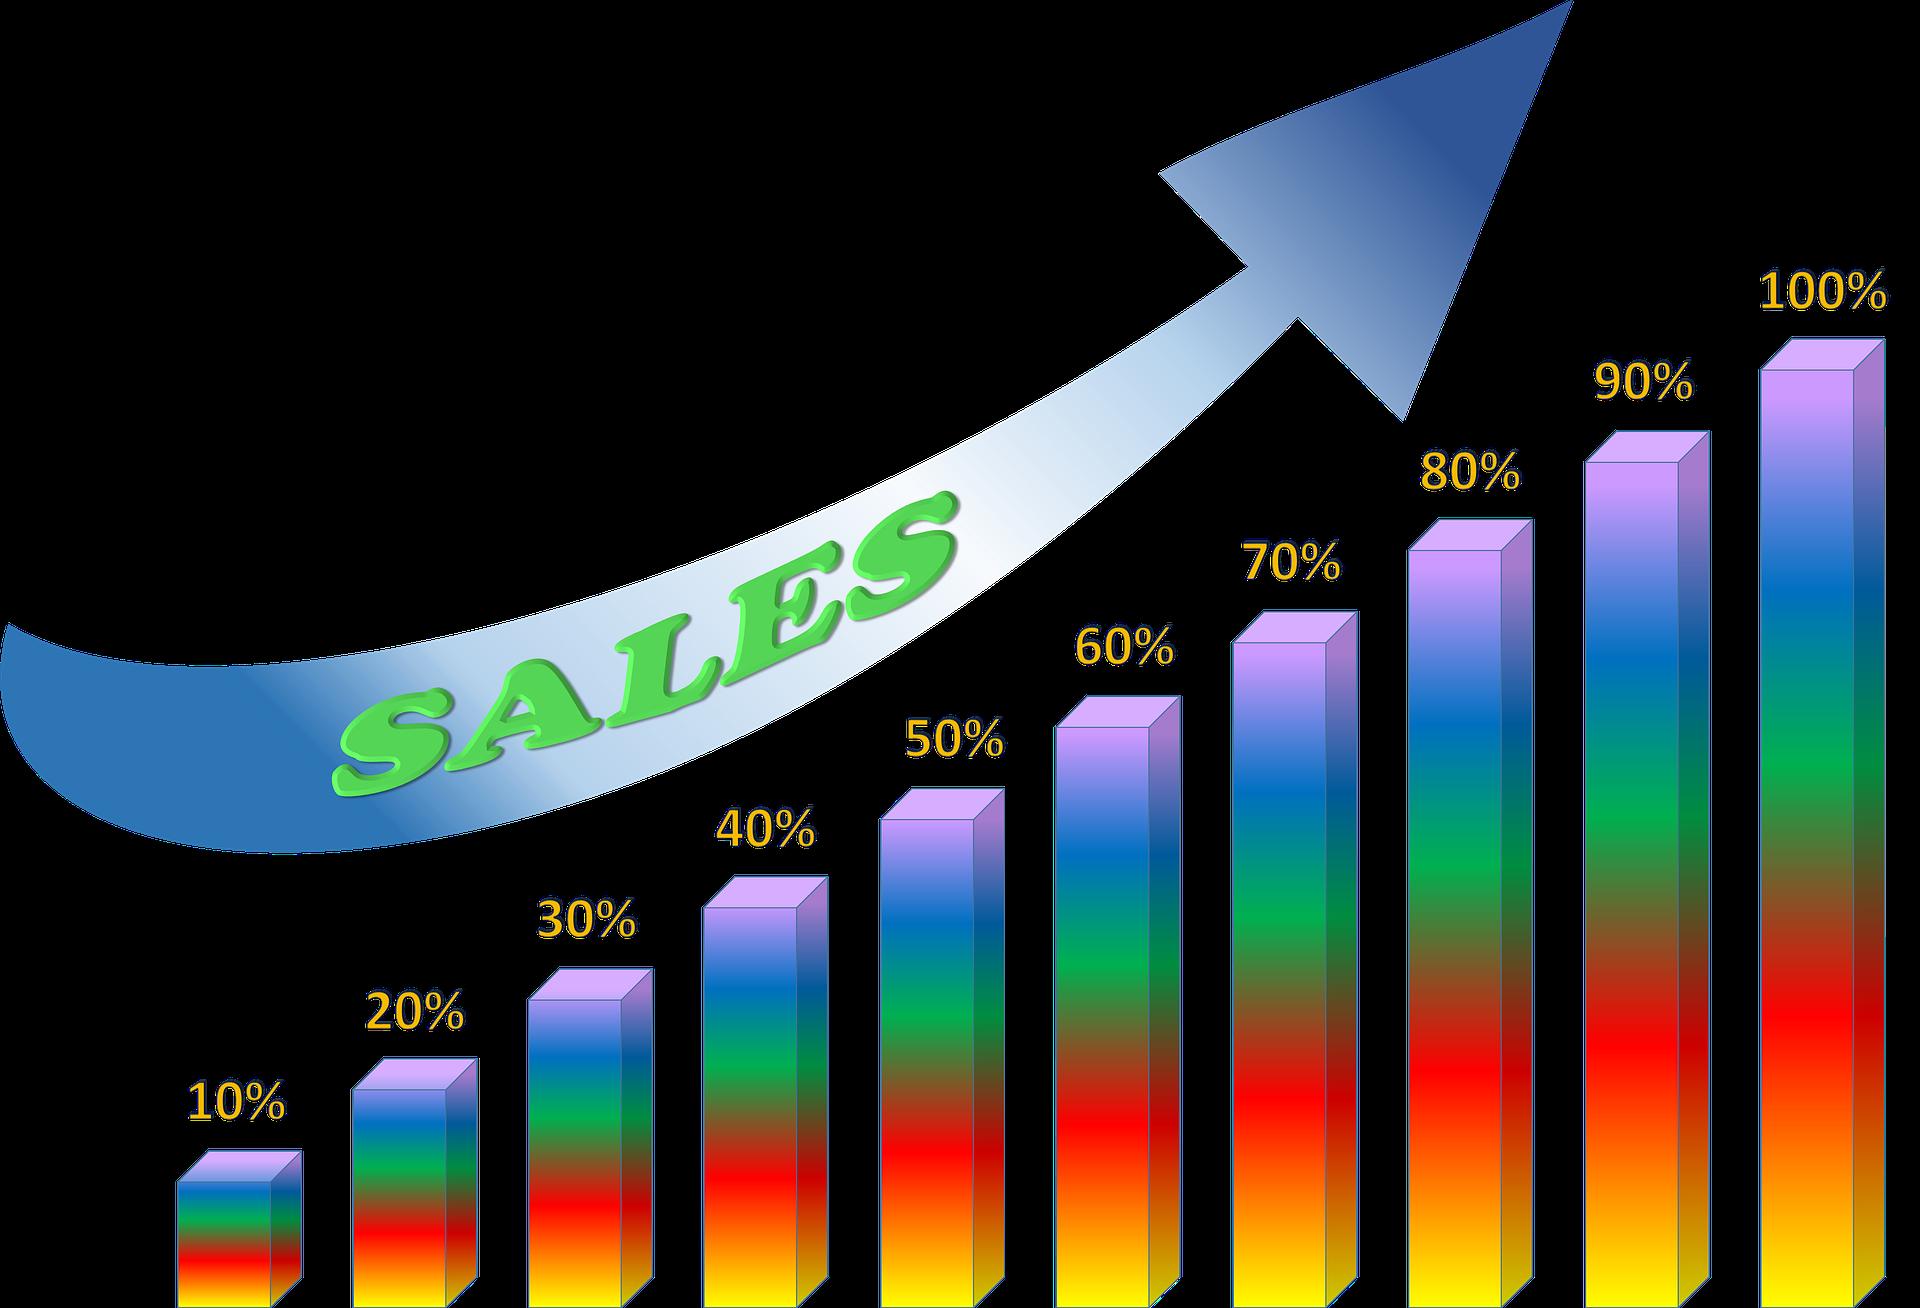 sales graph-841606_1920